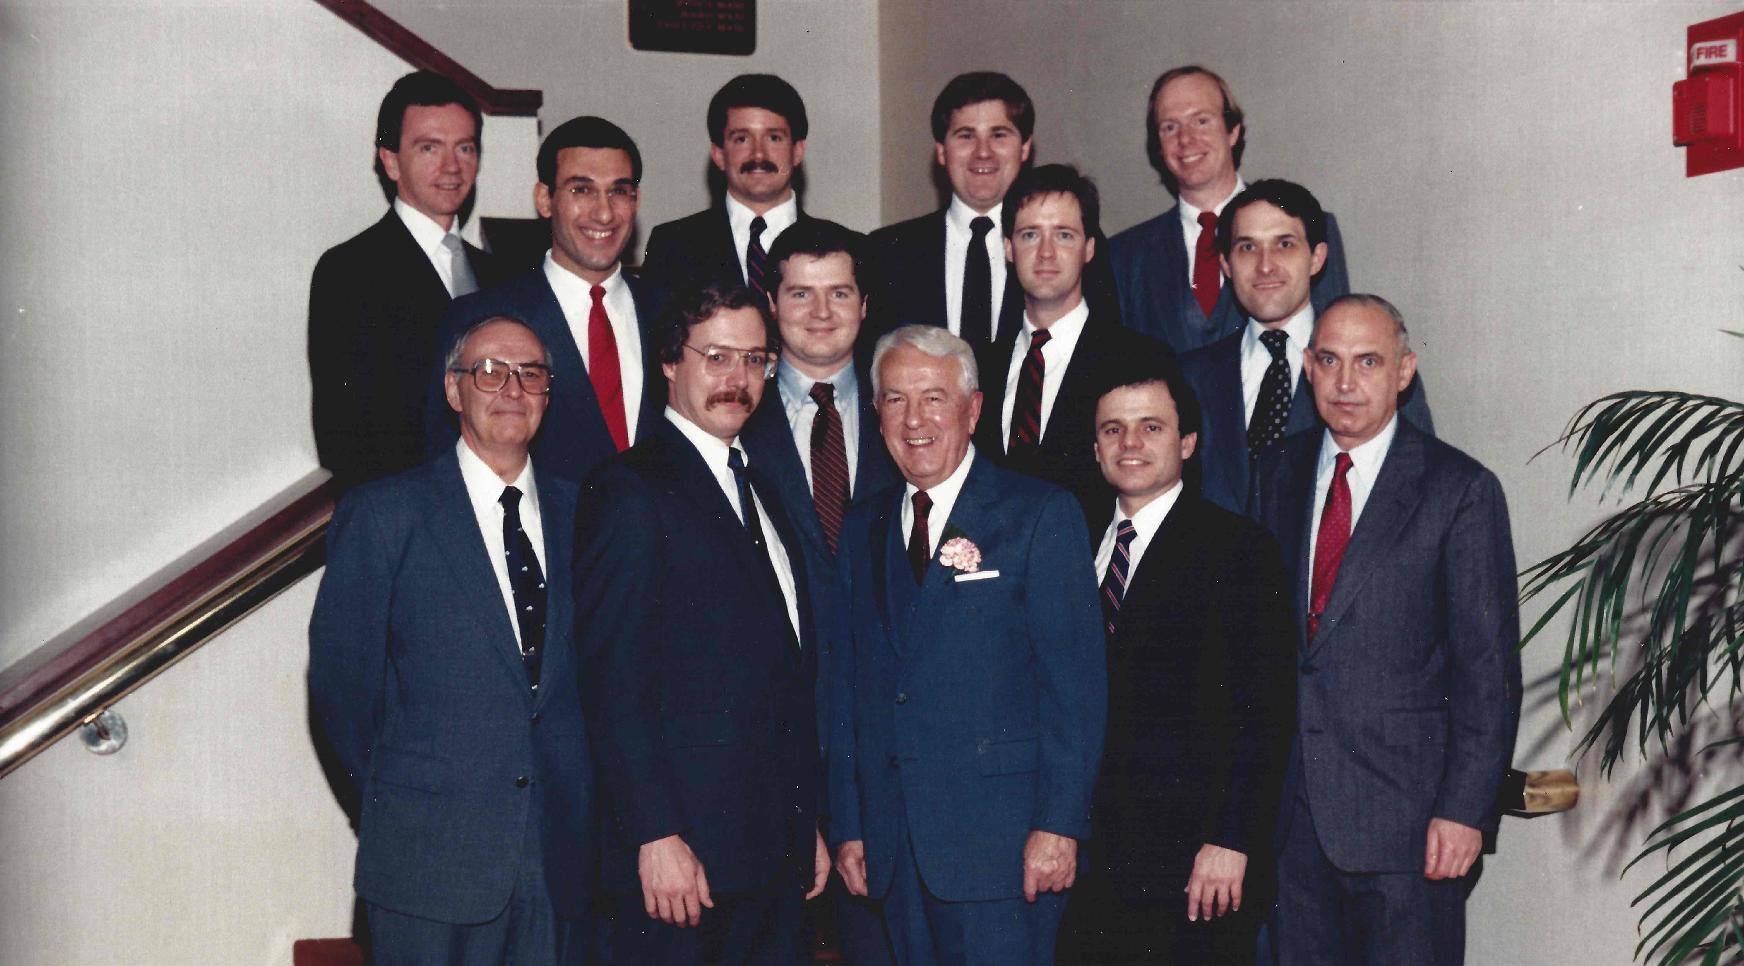 The 100th Anniversary of Judge Matthew J. Jasen's Birth: A Commemoration